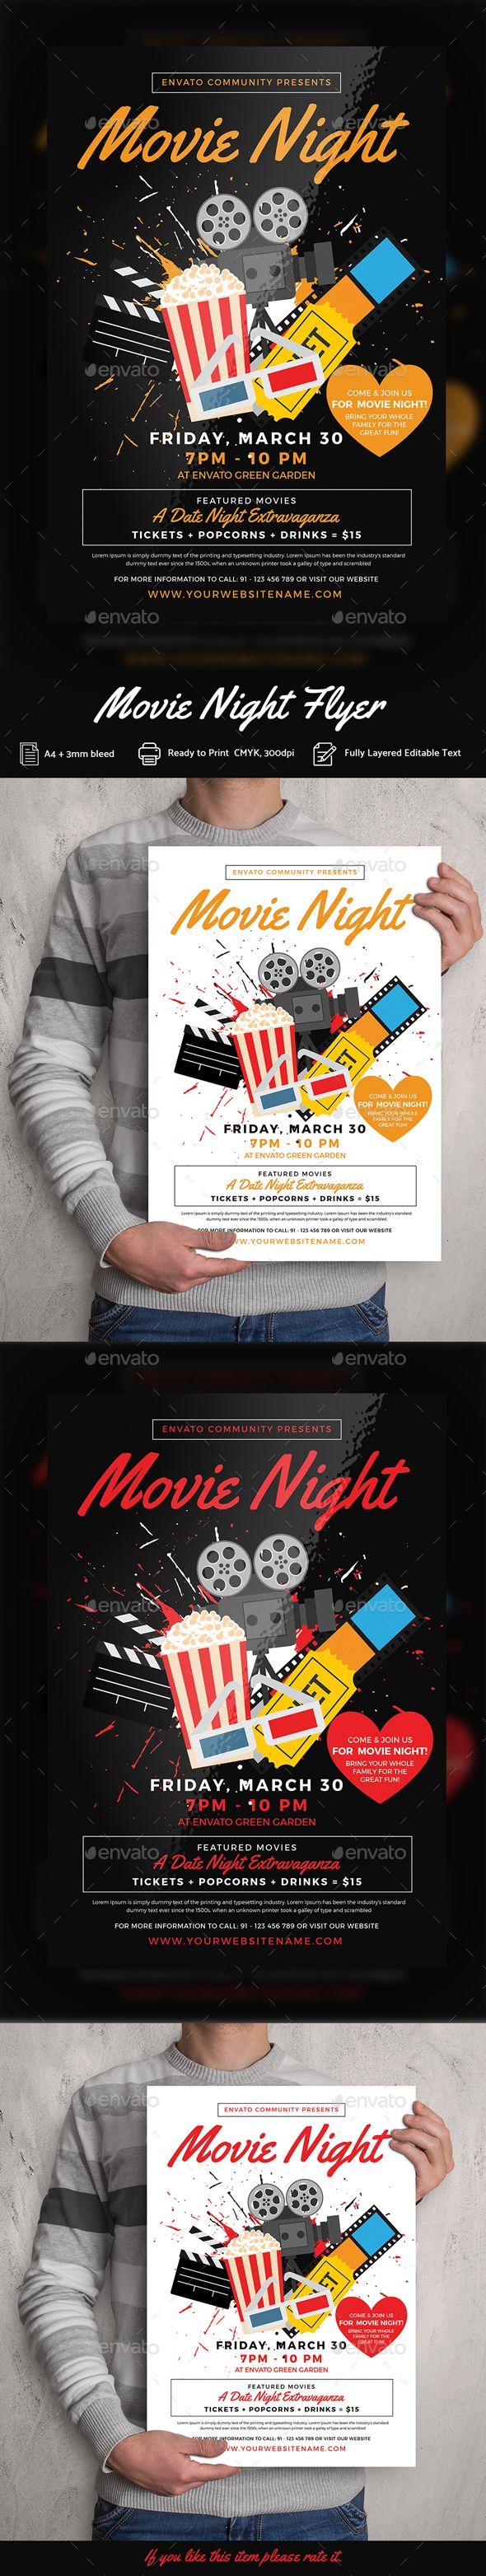 Movie Night Flyer Templates Photoshop Psd School Movie